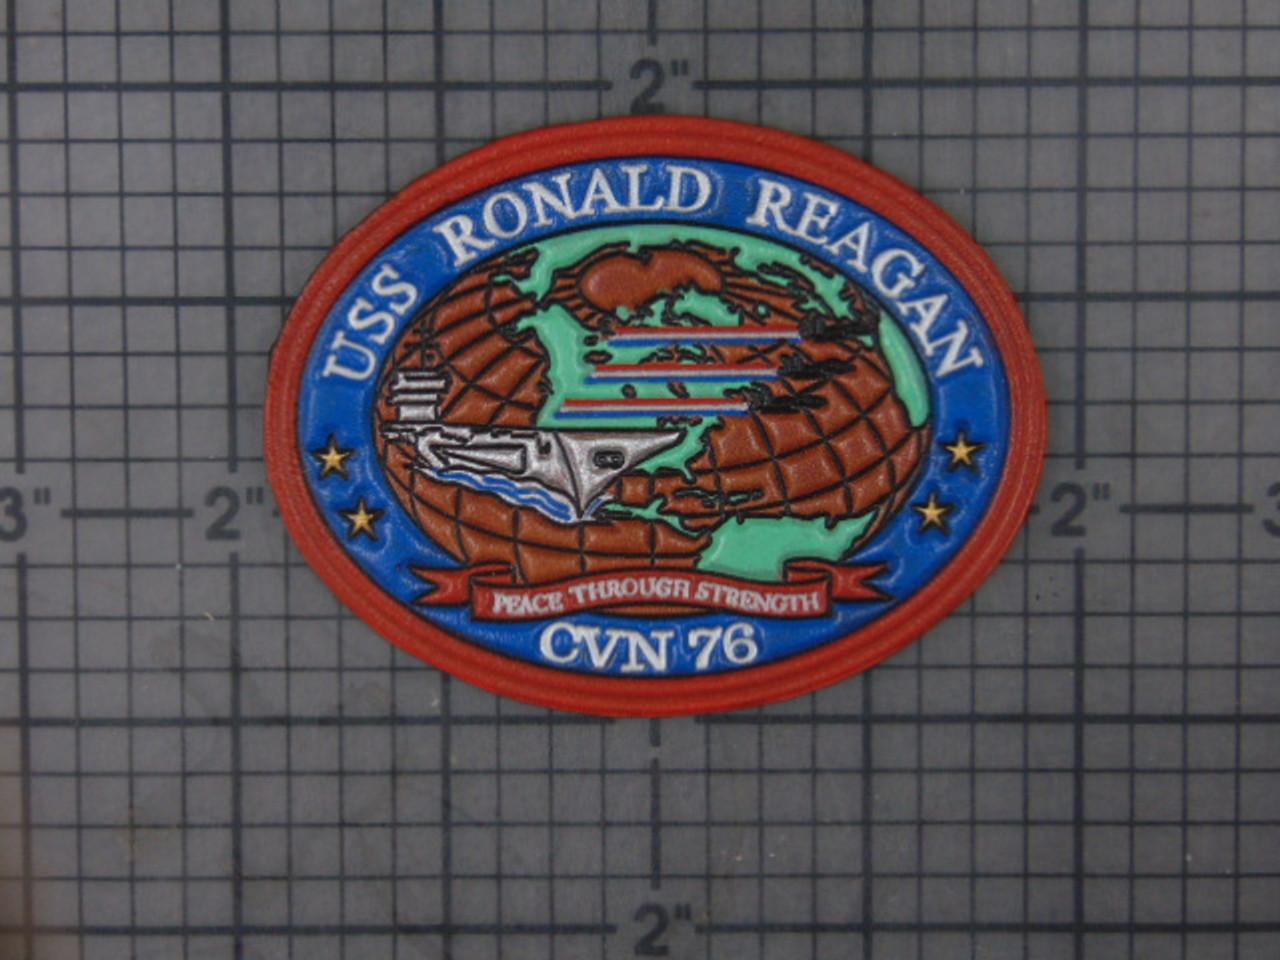 CVN-76 USS RONALD REAGAN   Embossed